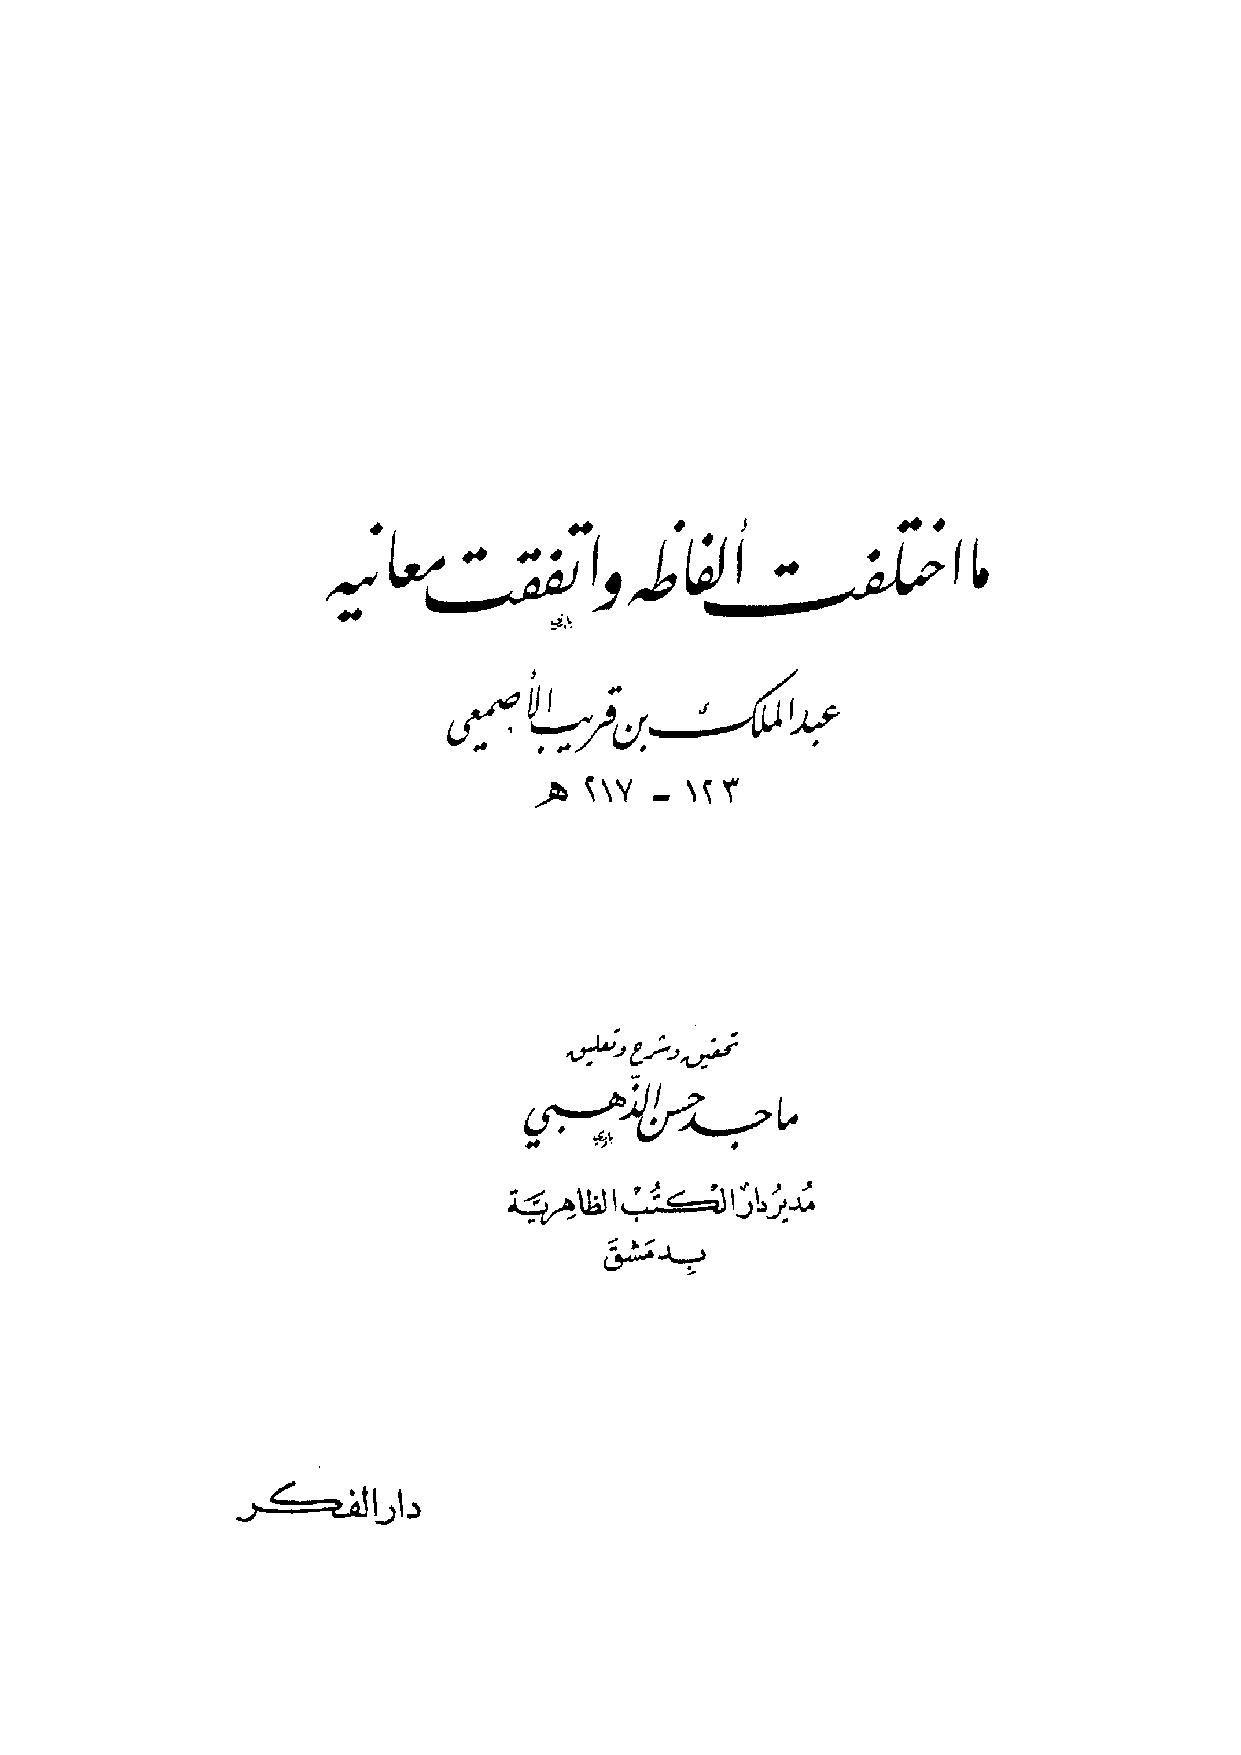 ما اختلفت ألفاظه و اتفقت معانيه Https Archive Org Download Adel Arabi7000 X Arabi08917 Pdf Math Arabic Calligraphy Math Equations